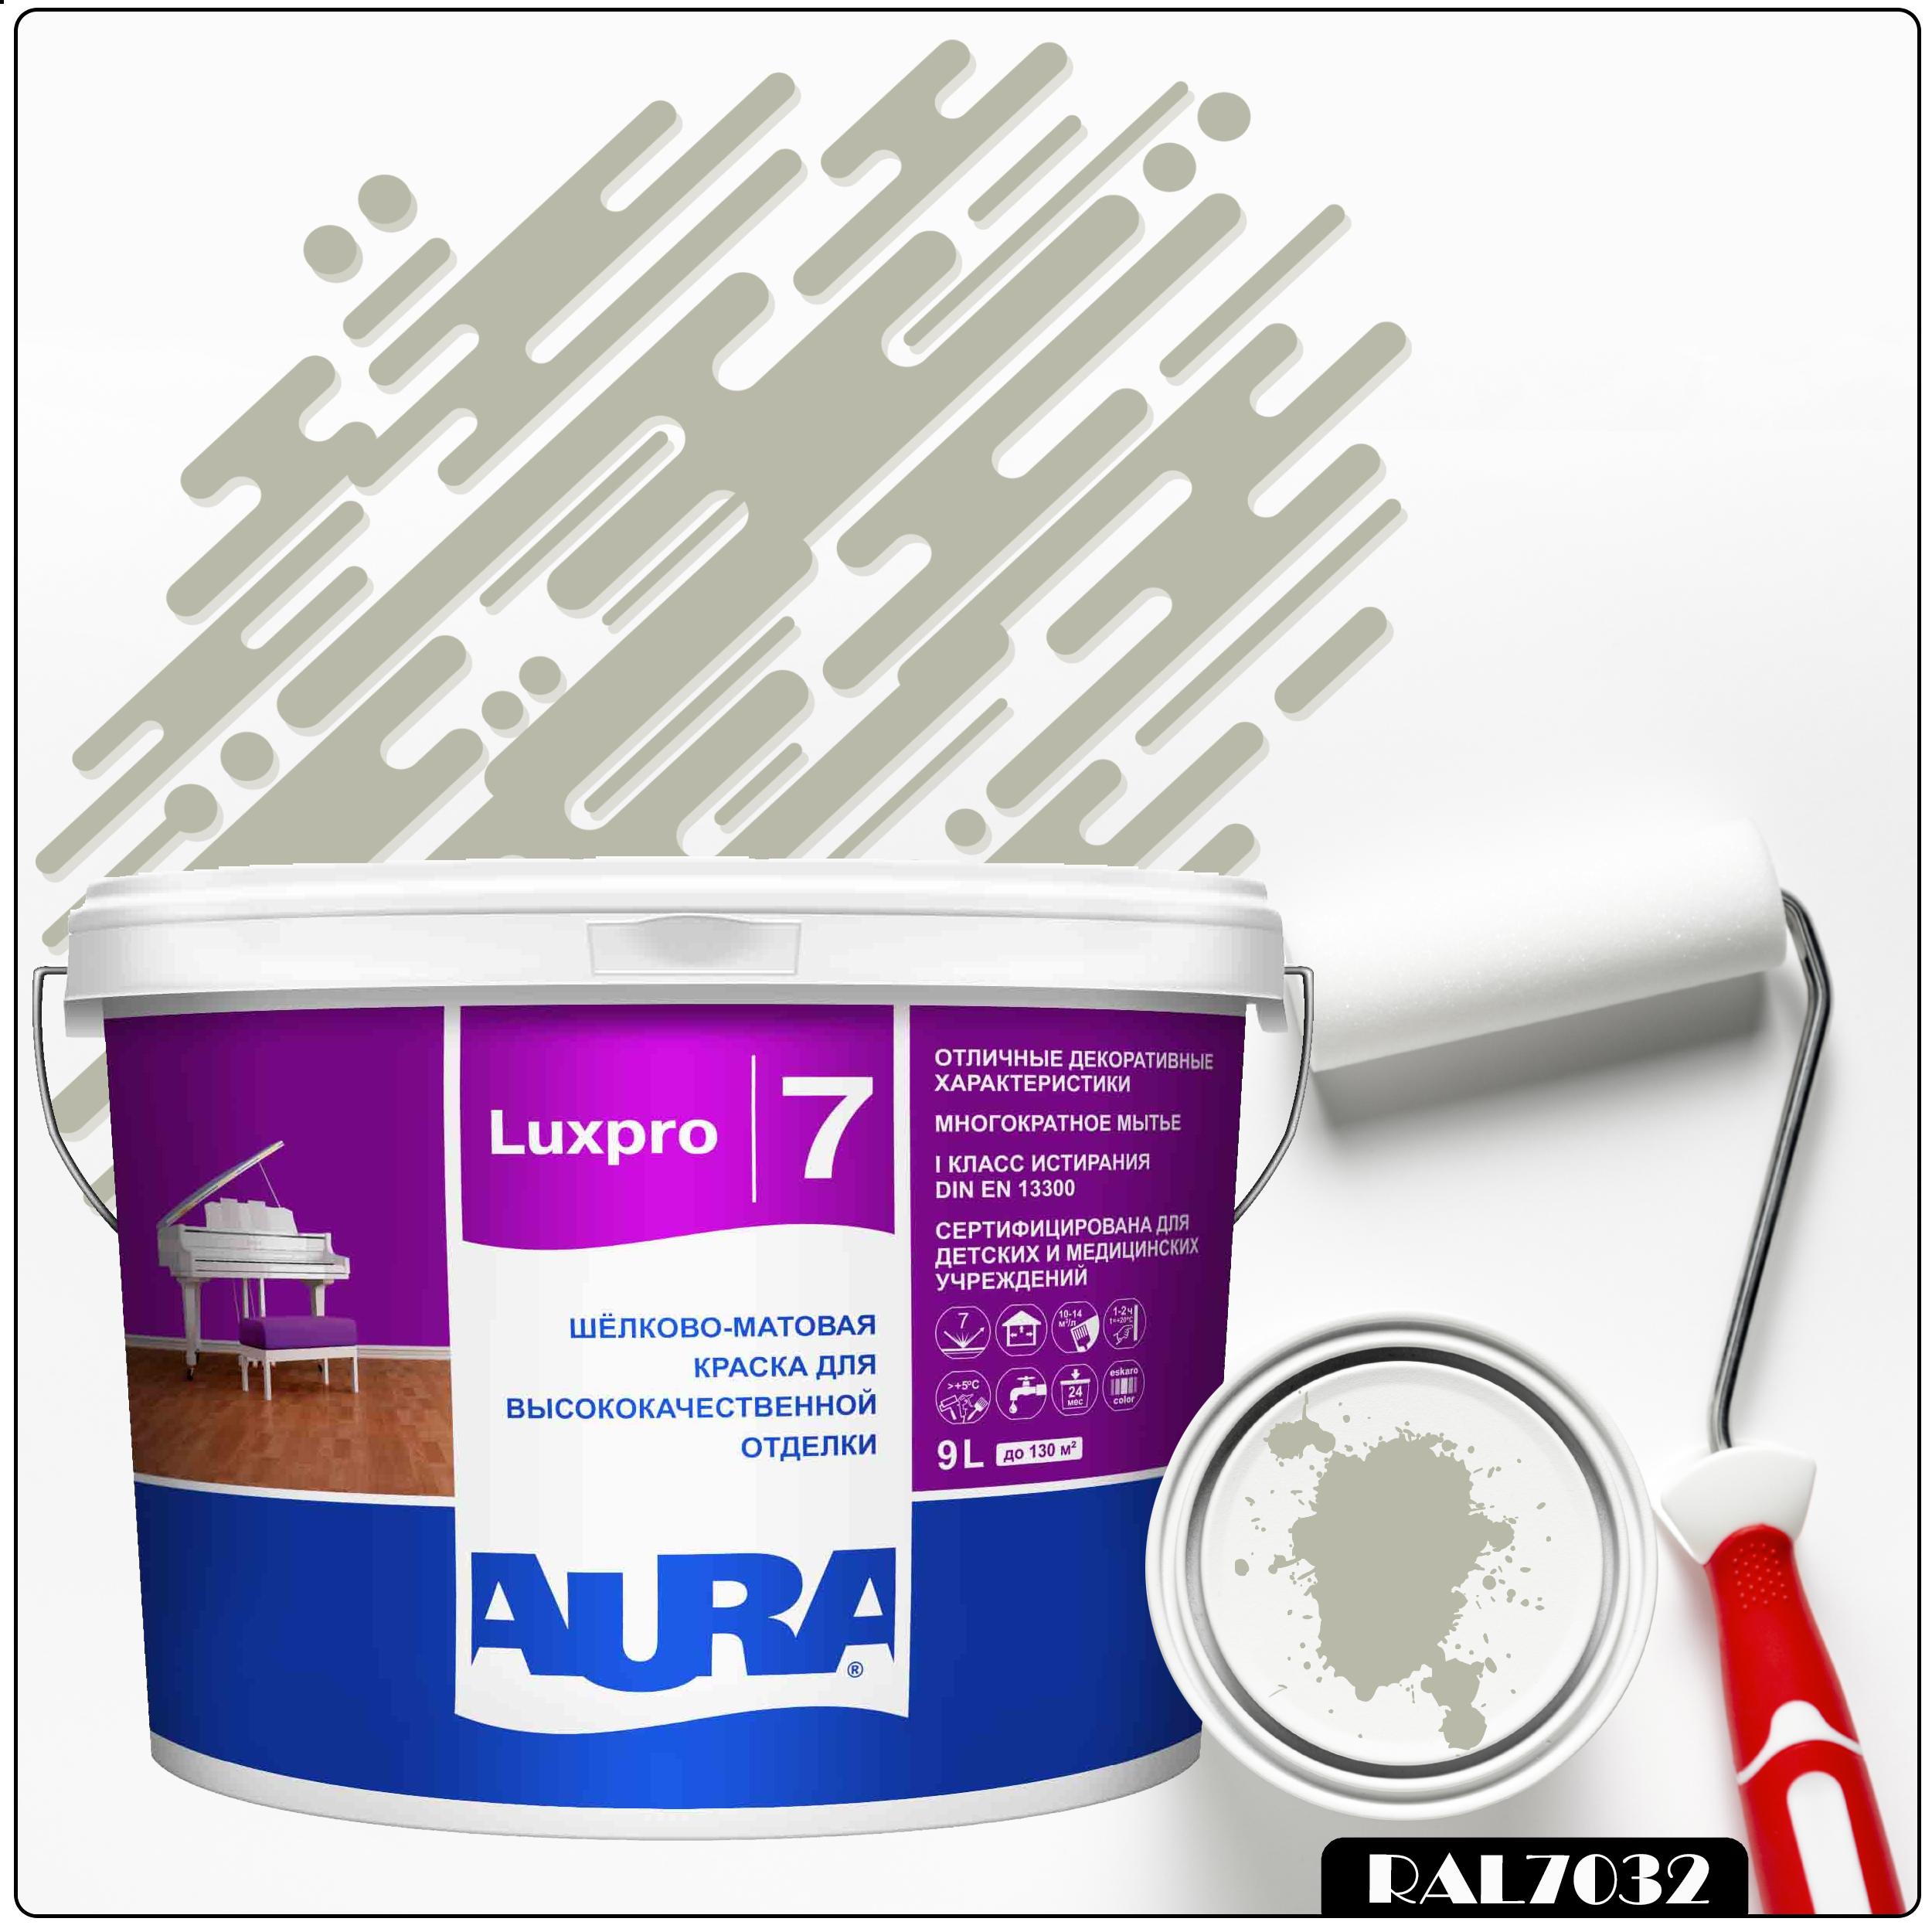 Фото 23 - Краска Aura LuxPRO 7, RAL 7032 Серая галька, латексная, шелково-матовая, интерьерная, 9л, Аура.